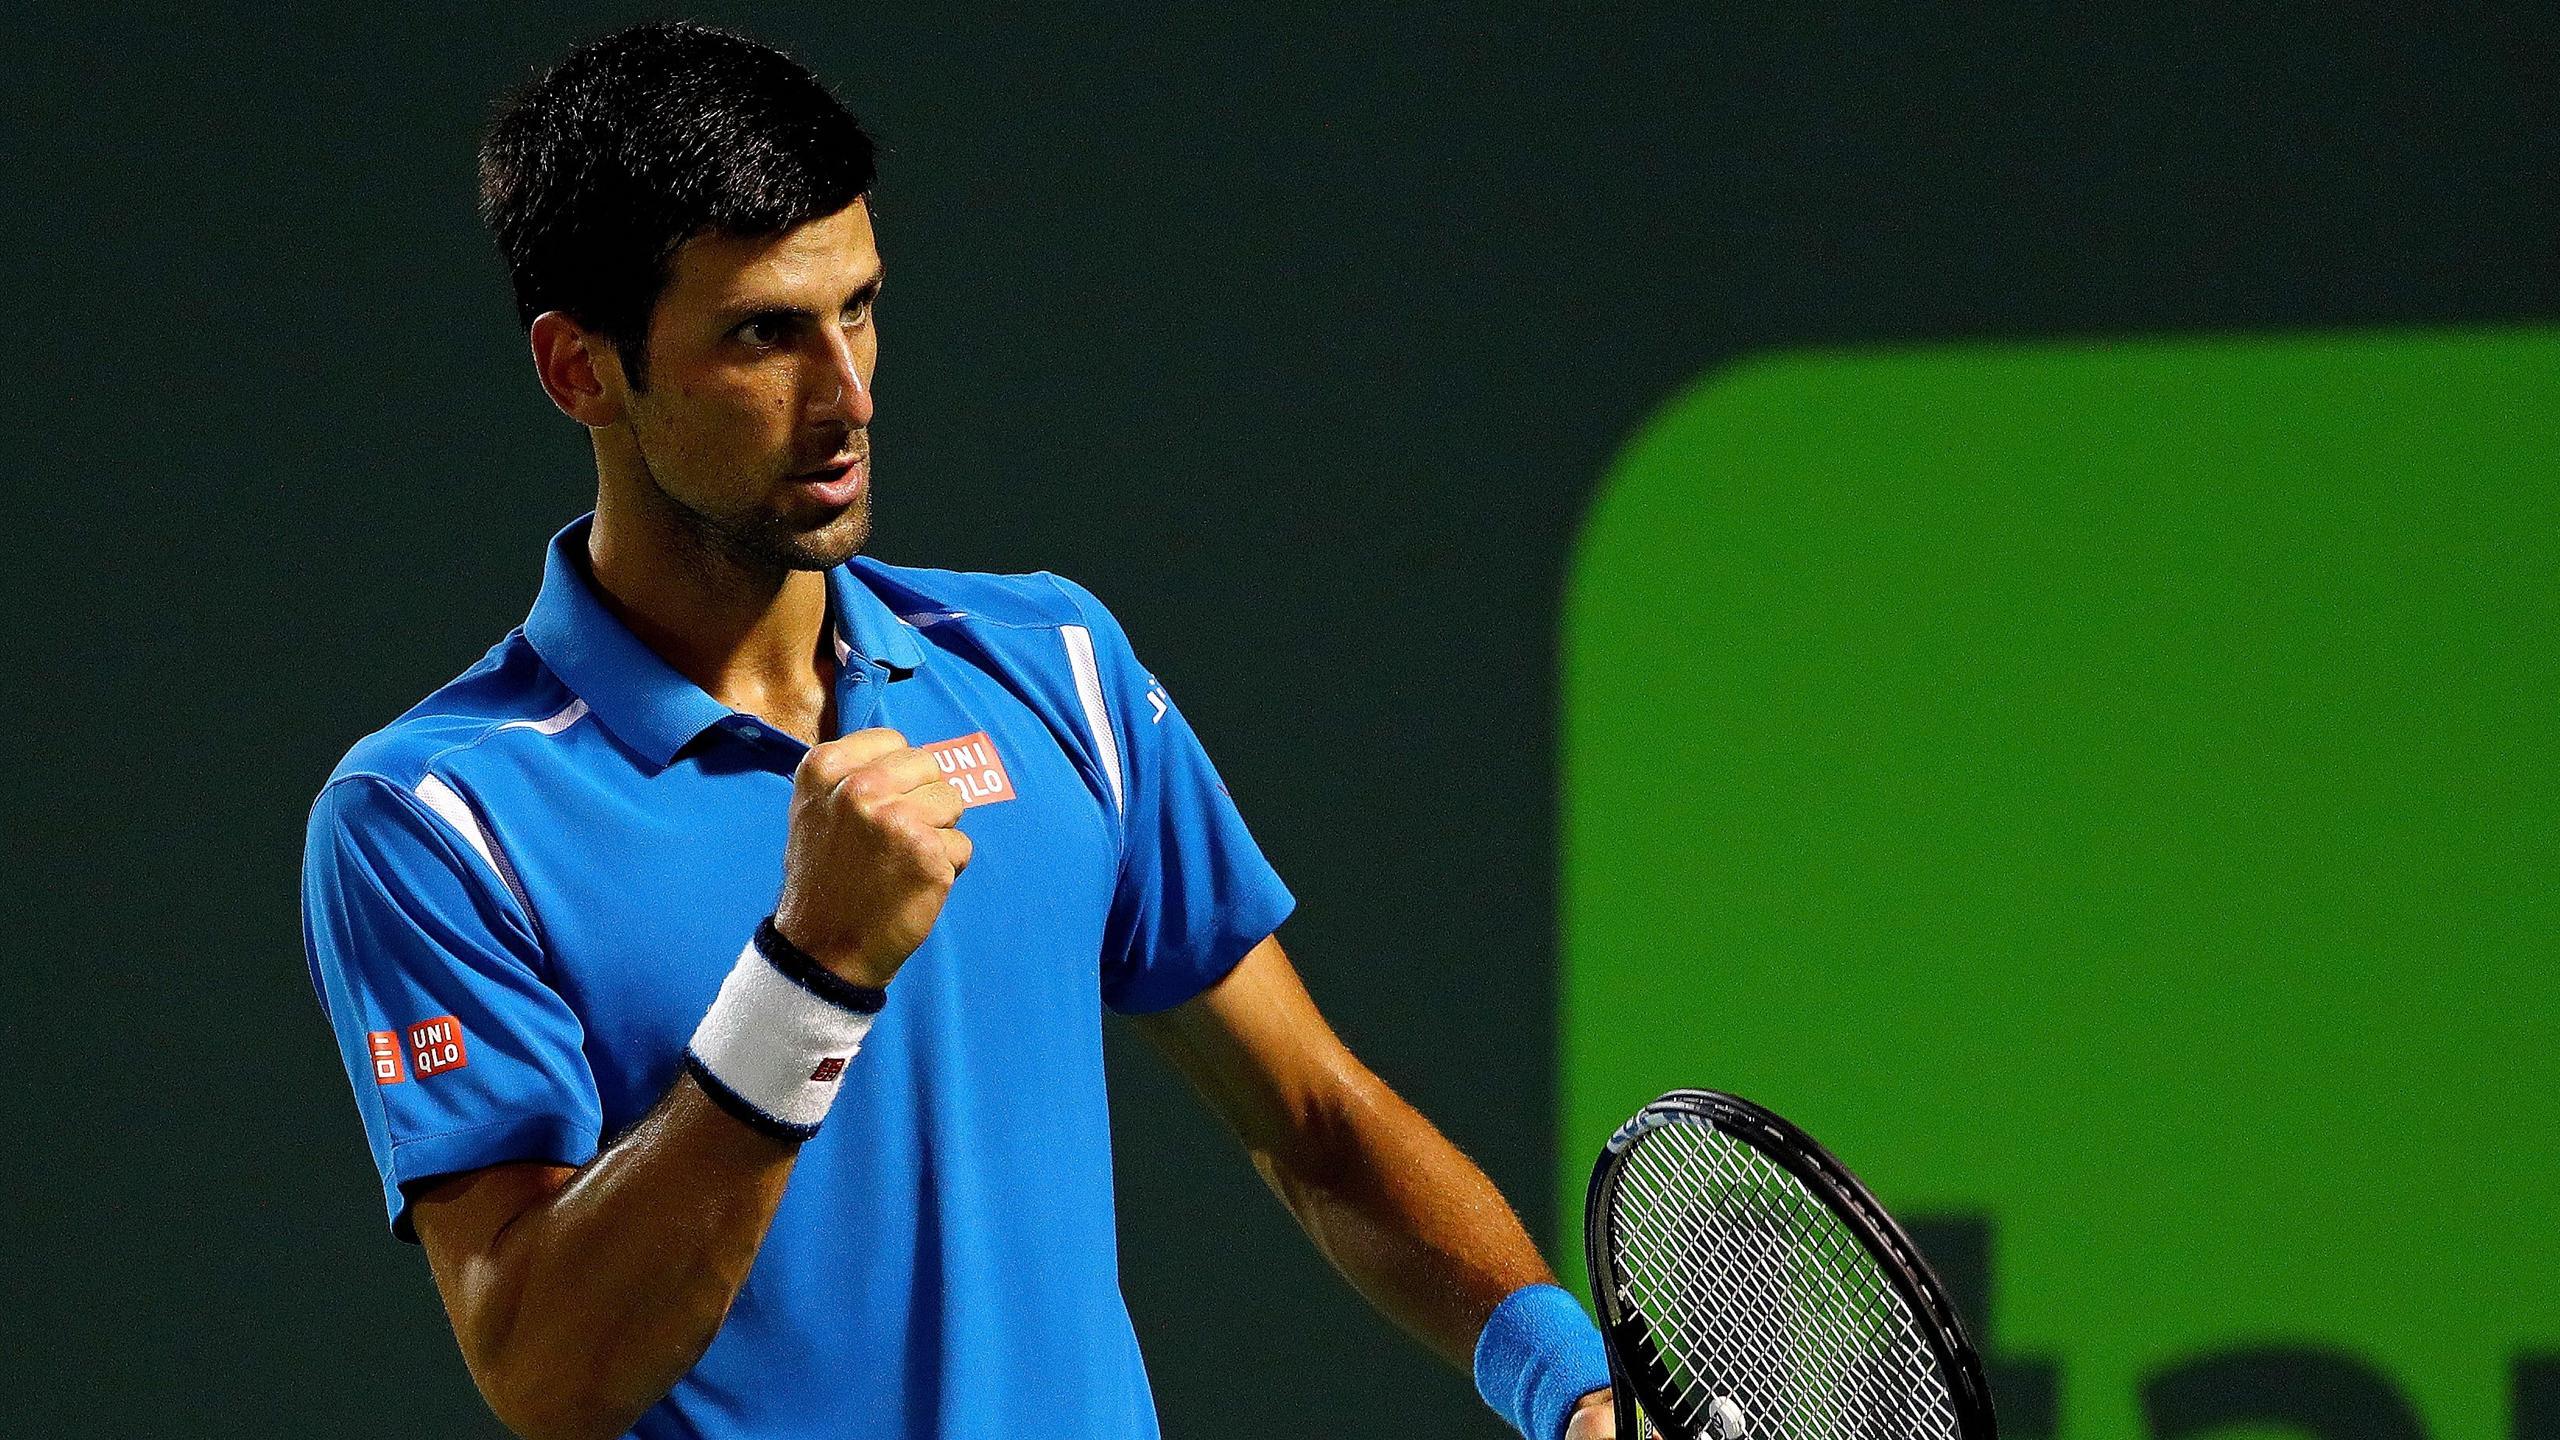 Novak Djokovic au Masters 1000 de Miami 2016